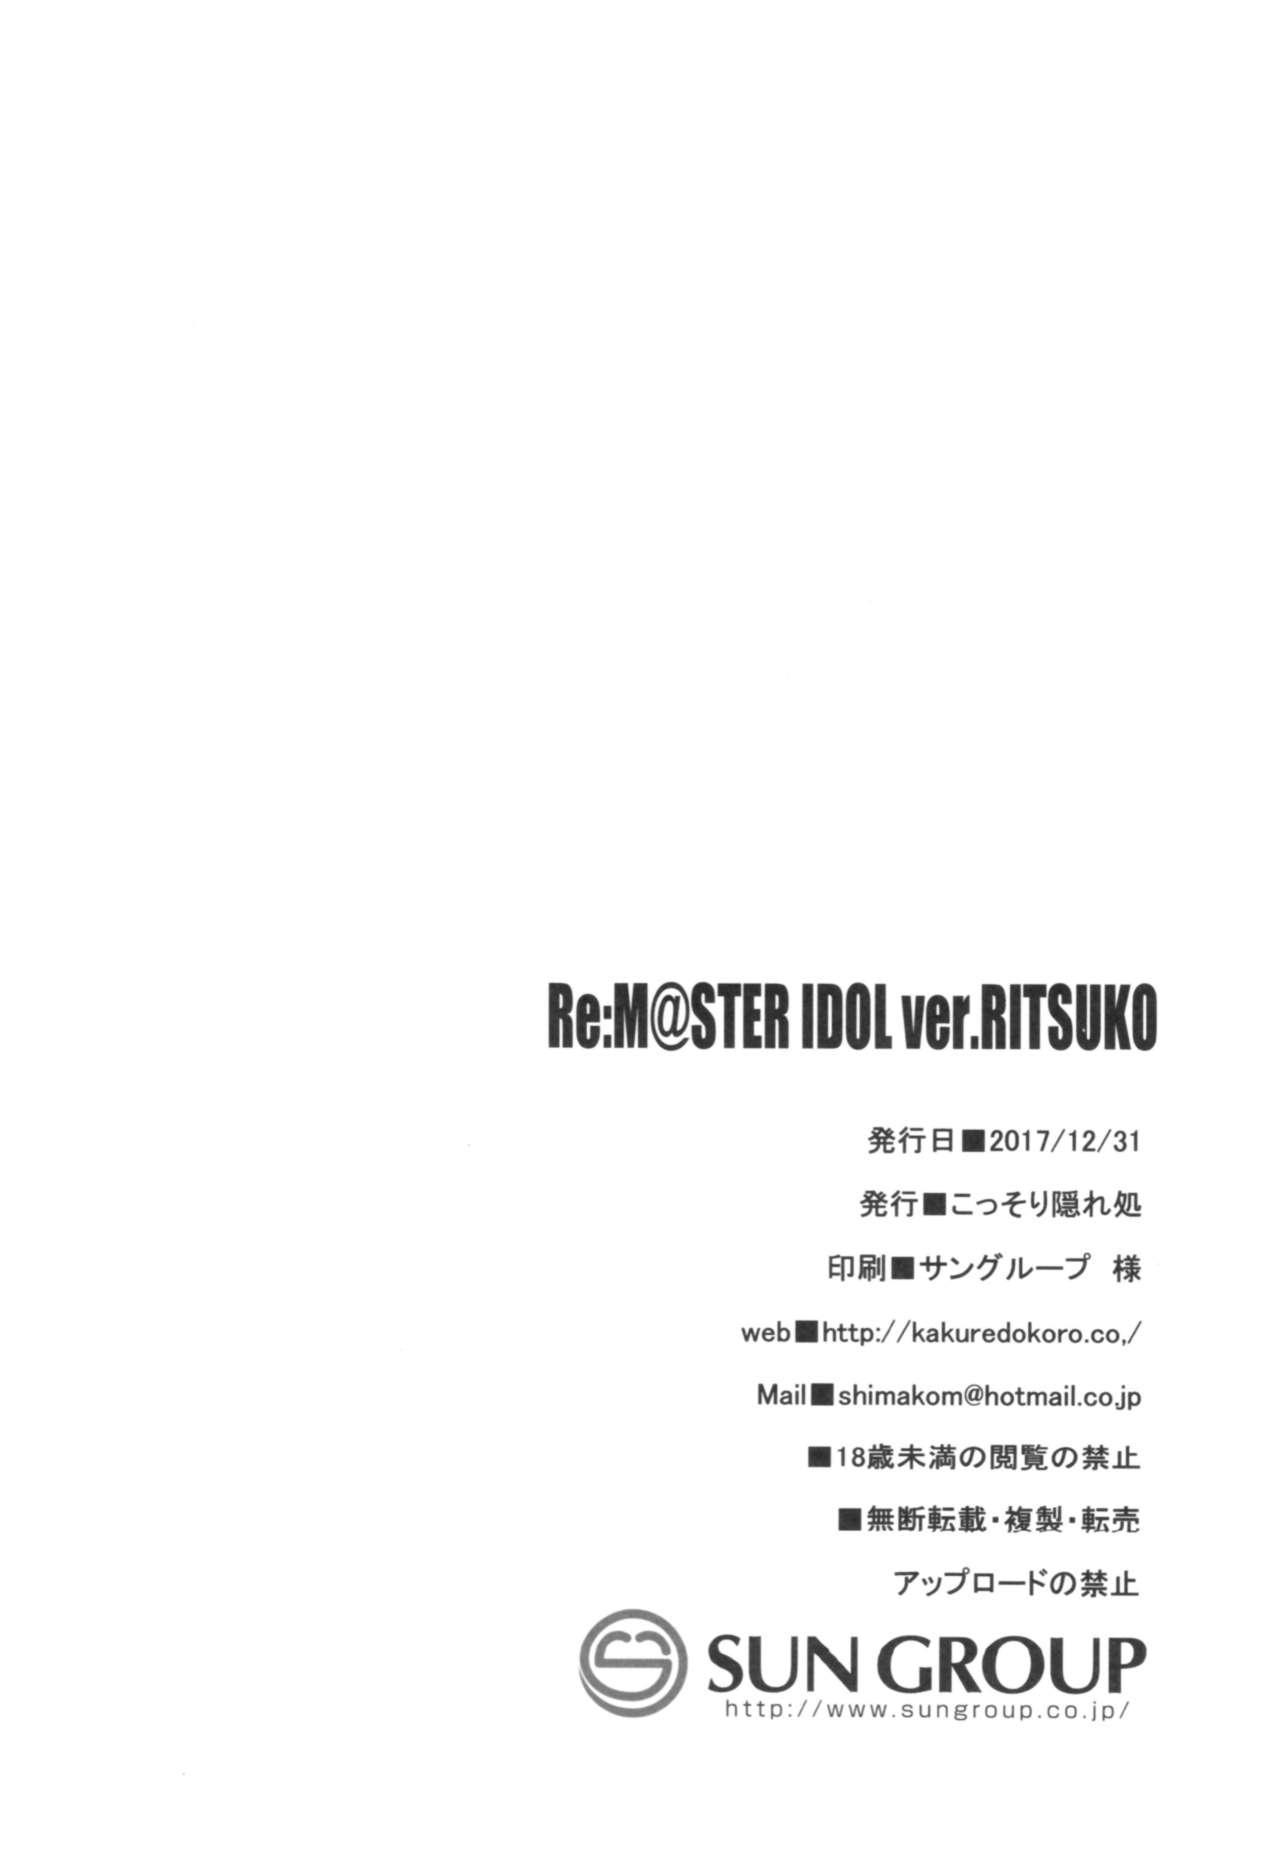 Re:M@STER IDOL ver.RITSUKO 22